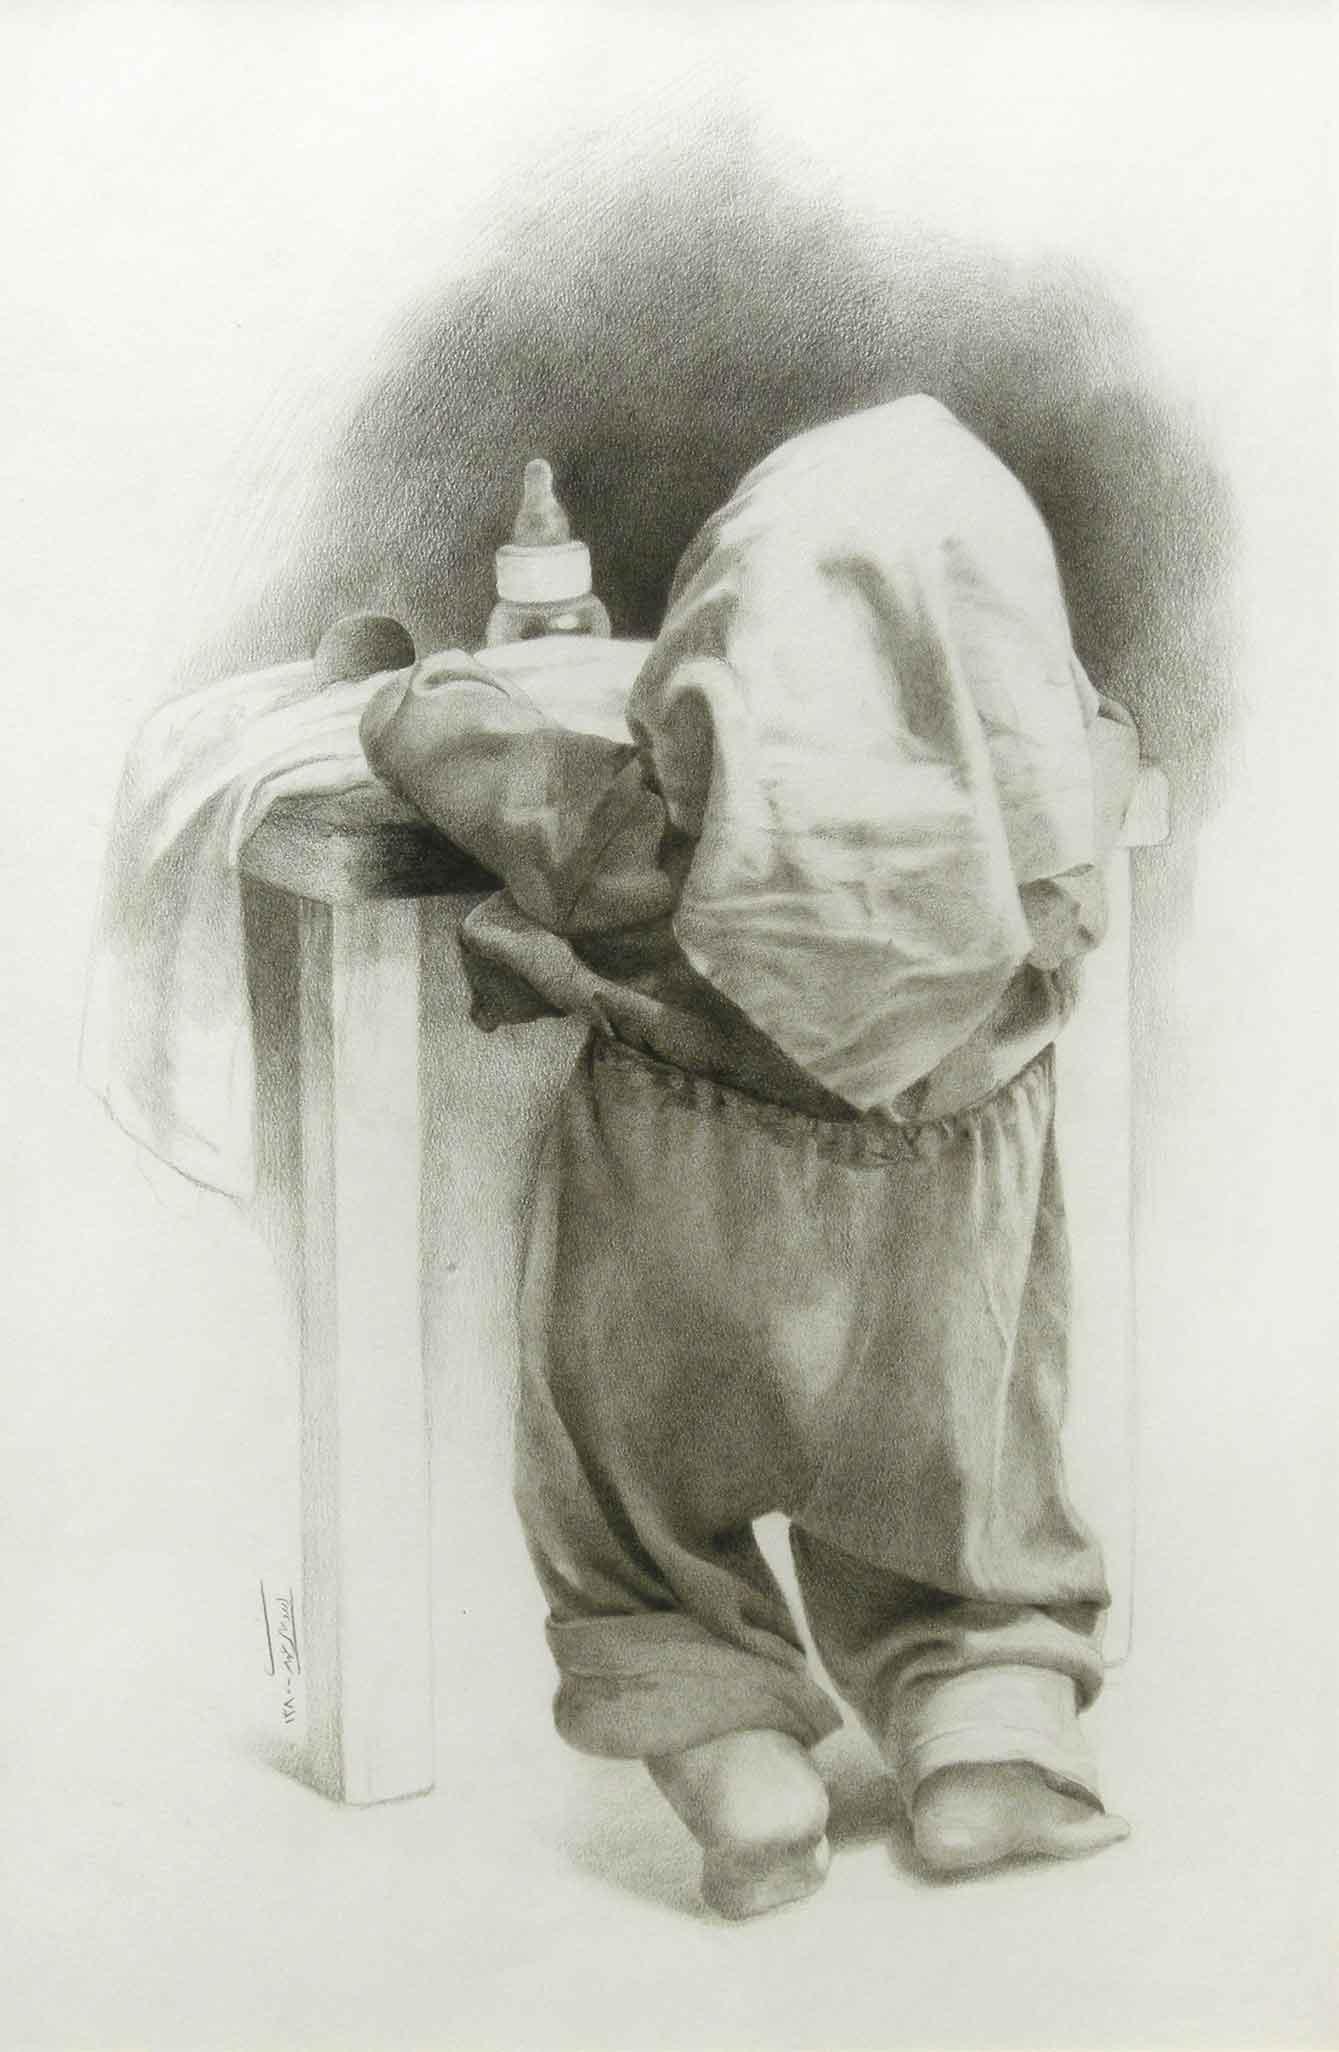 First Efferd, Brown pencil on Paper, 36x40, 2001